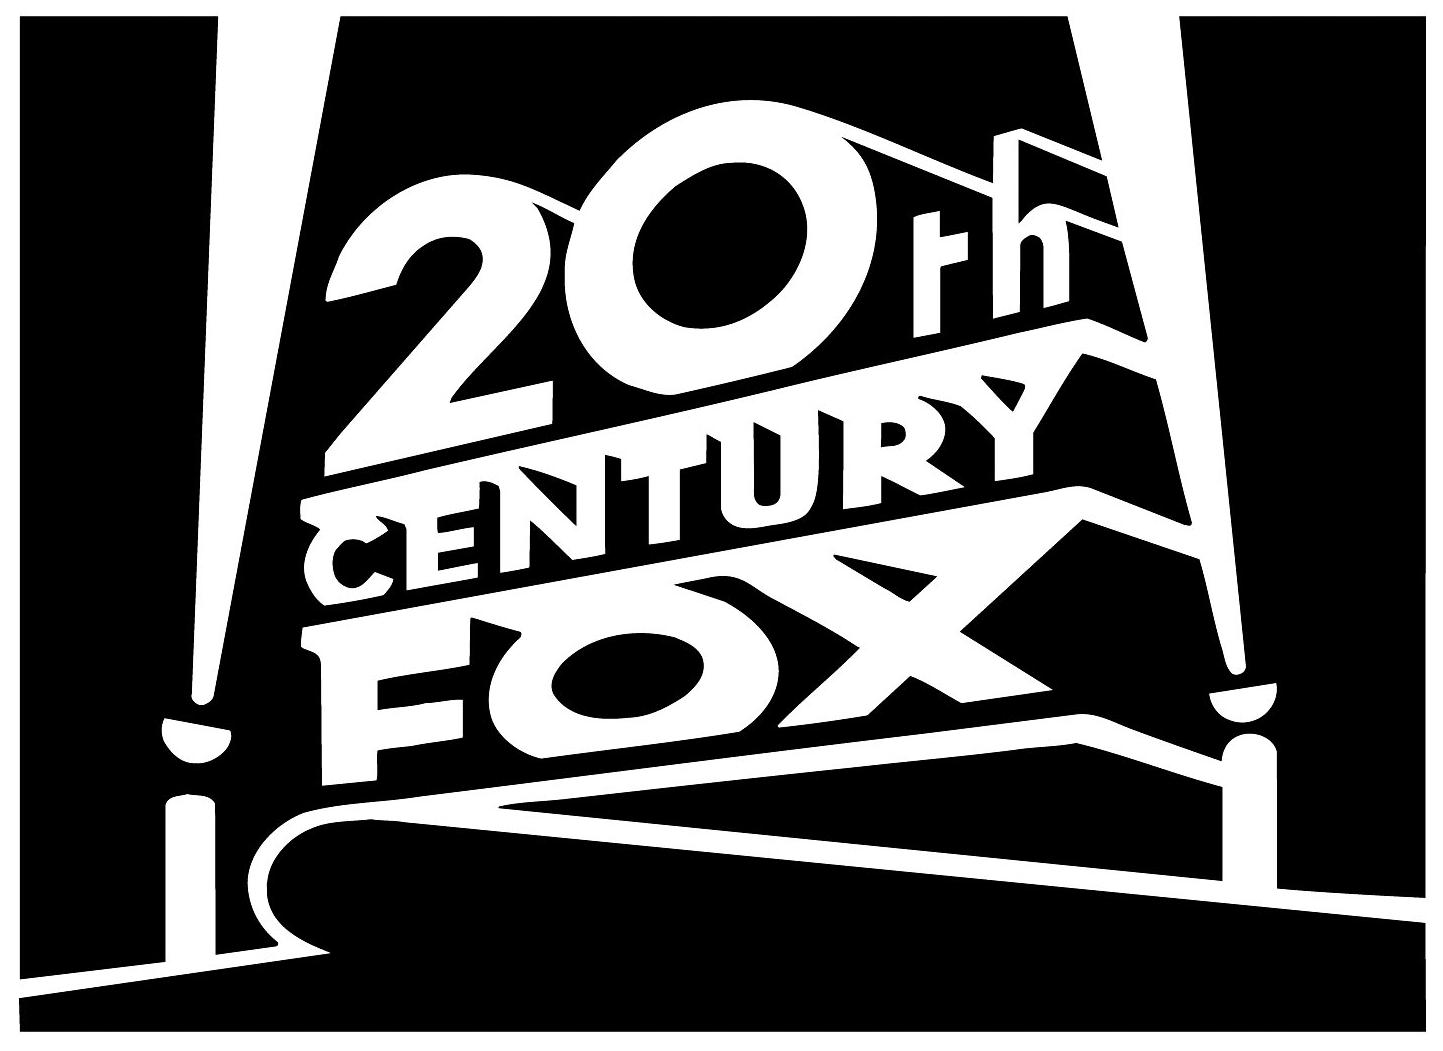 Fox Logos Google Search Fox Logo 20th Century Studios 20th Century Fox